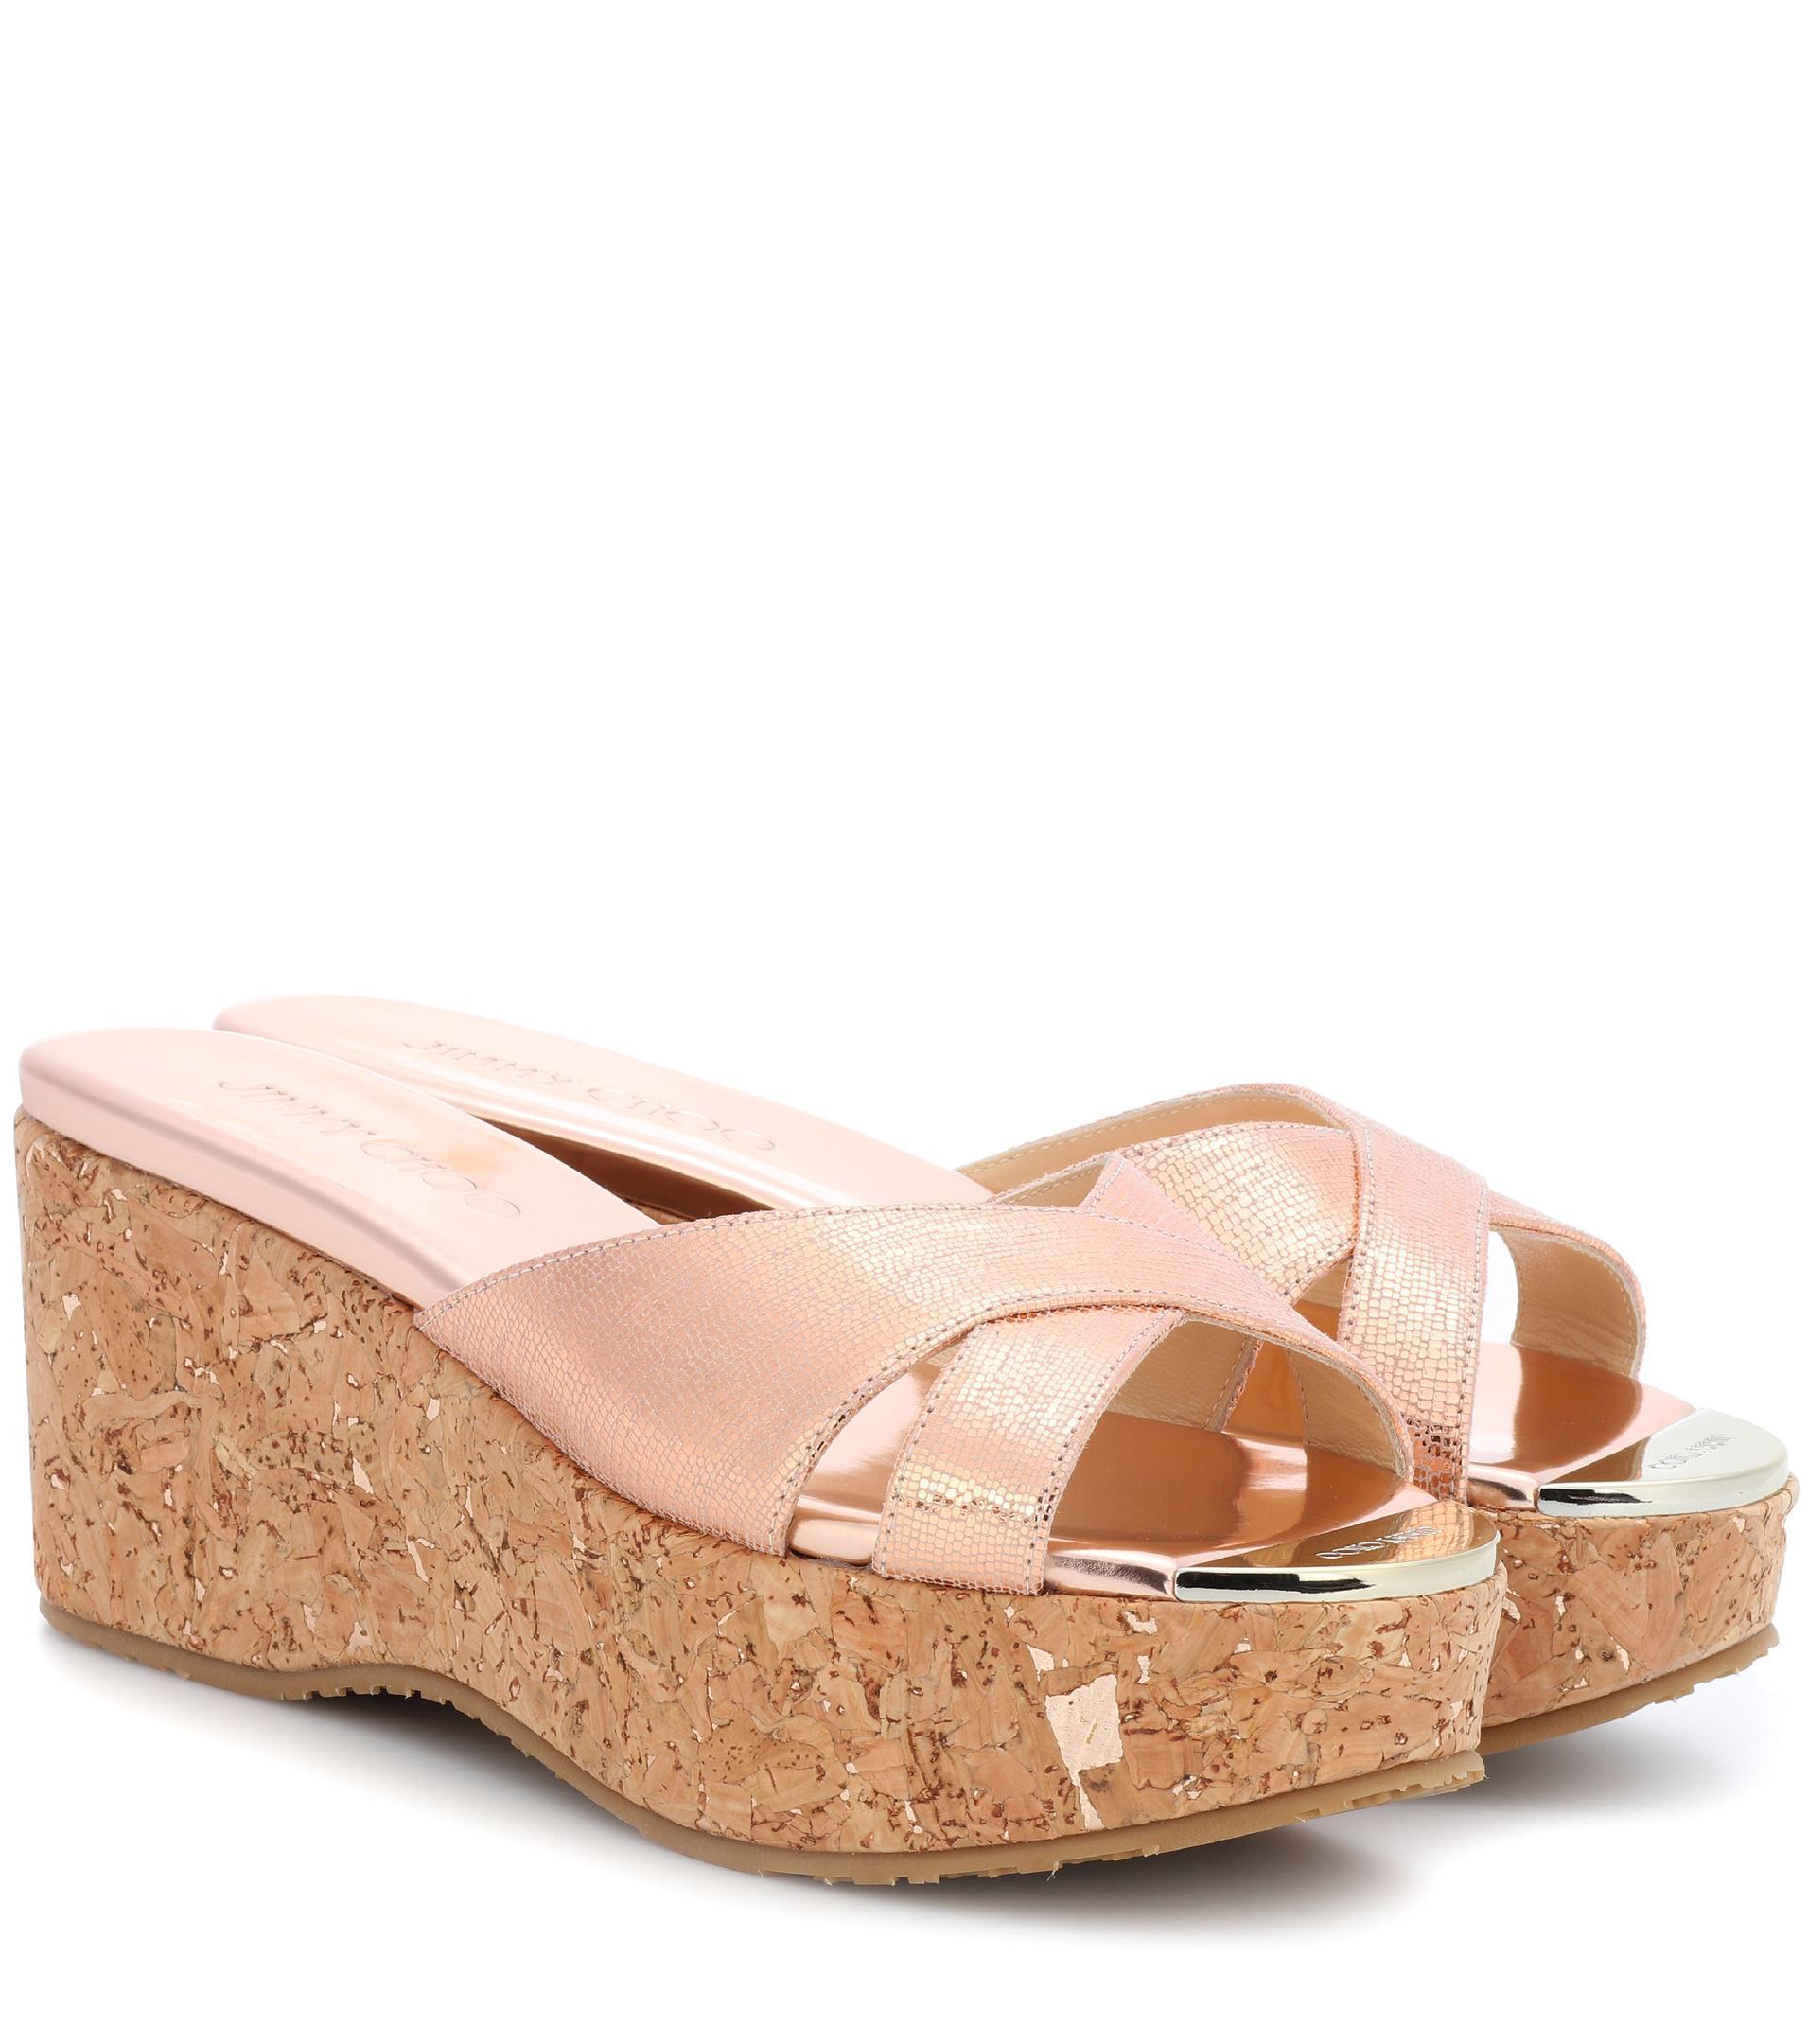 15c4475ec943 Jimmy Choo Prima Leather Wedge Sandals in Metallic - Lyst